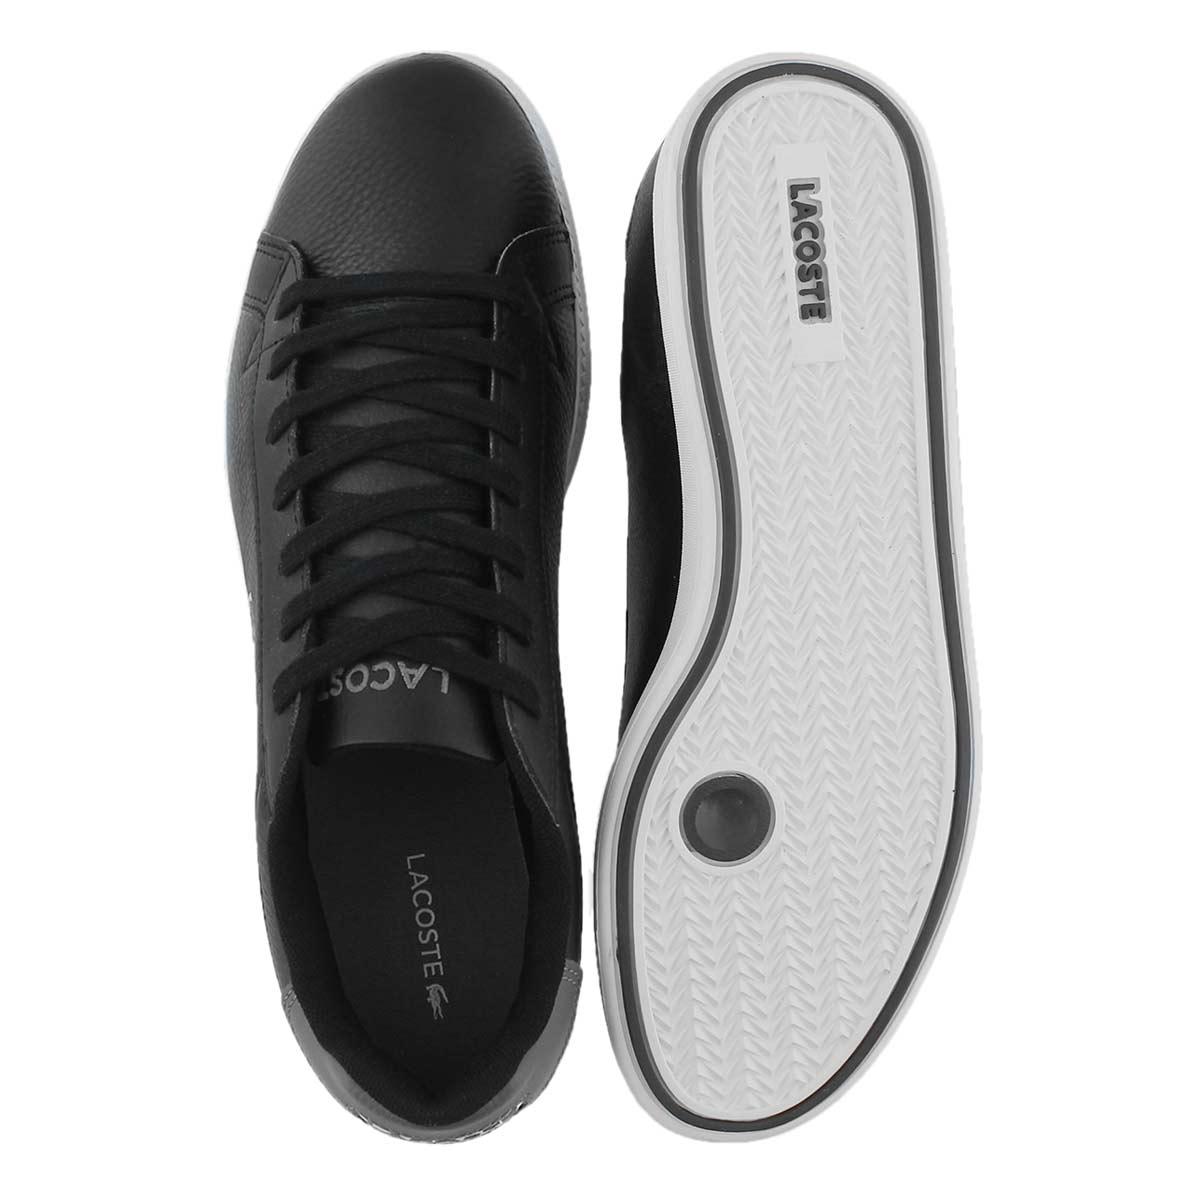 Mns Graduate LCR3 118 blk/dkgry sneaker